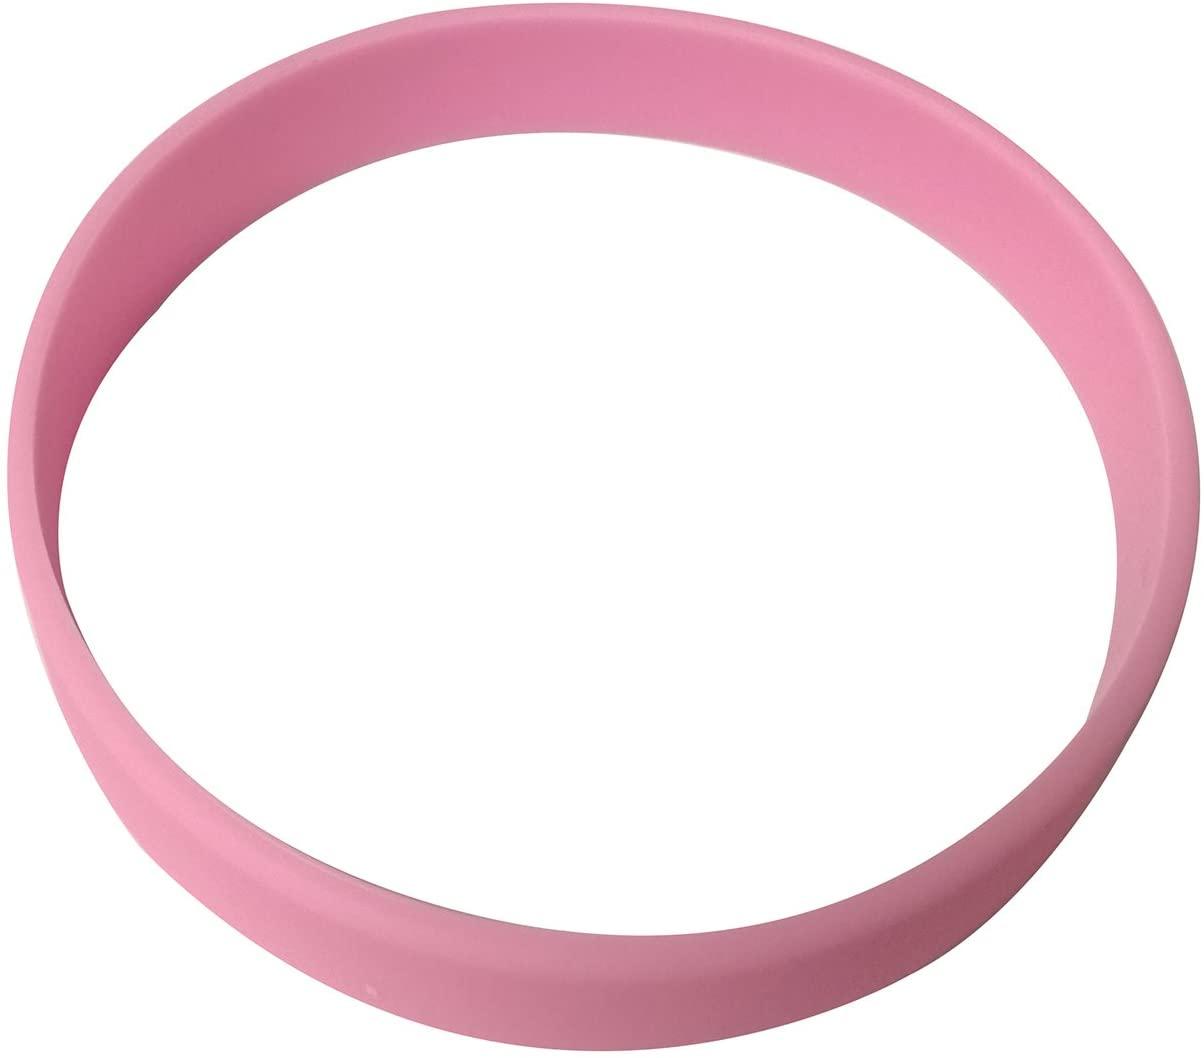 Vitalite 100pcs/set Plain Silicone Wristbands Blank Rubber Bracelets for Children